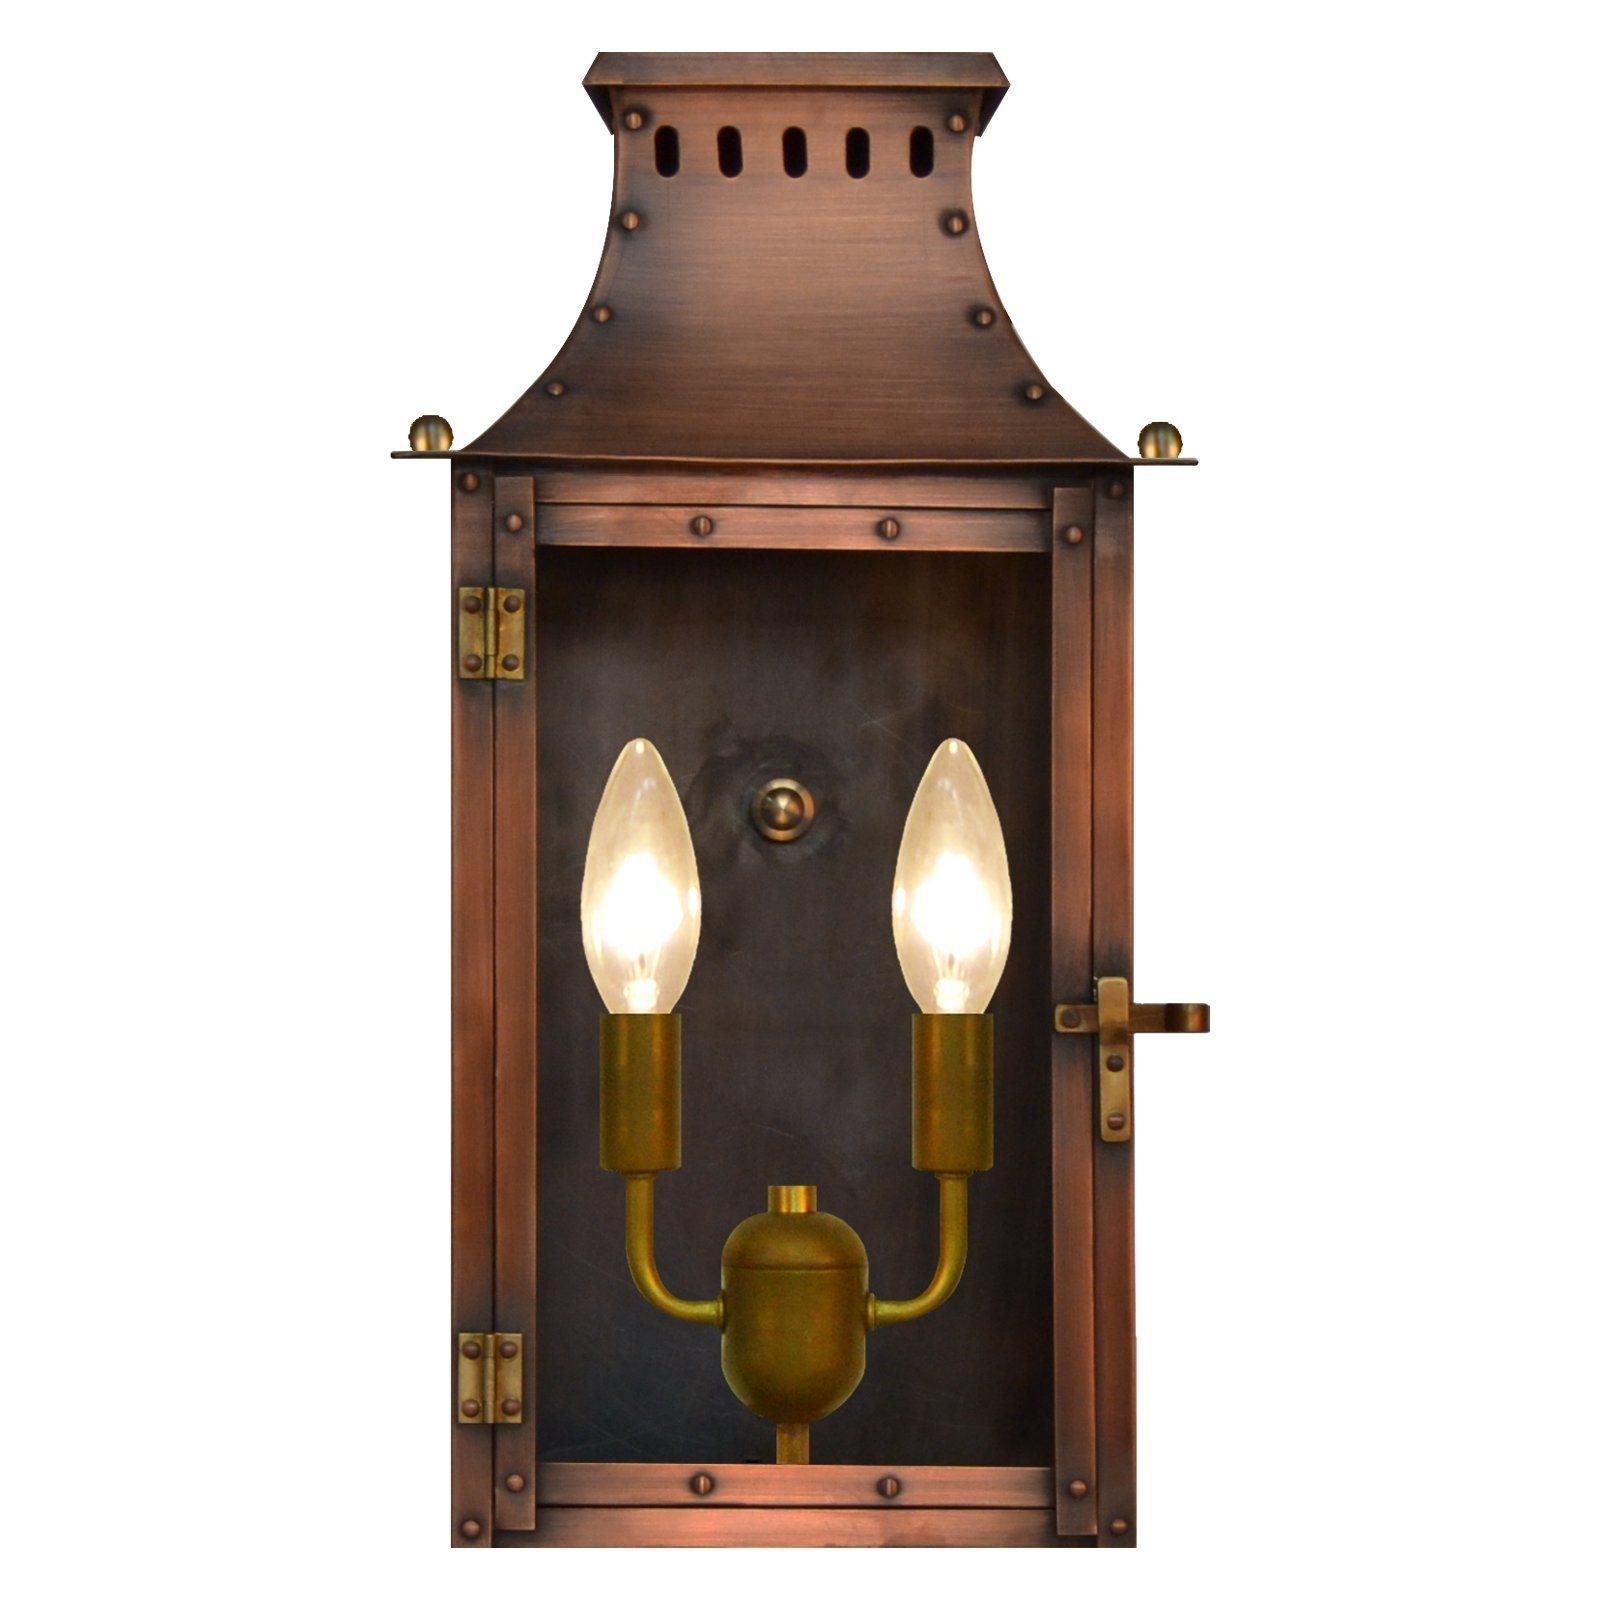 The Coppersmith York Town Yk Outdoor Flush Mount Lantern – Yk 16E Regarding Copper Outdoor Electric Lanterns (View 19 of 20)